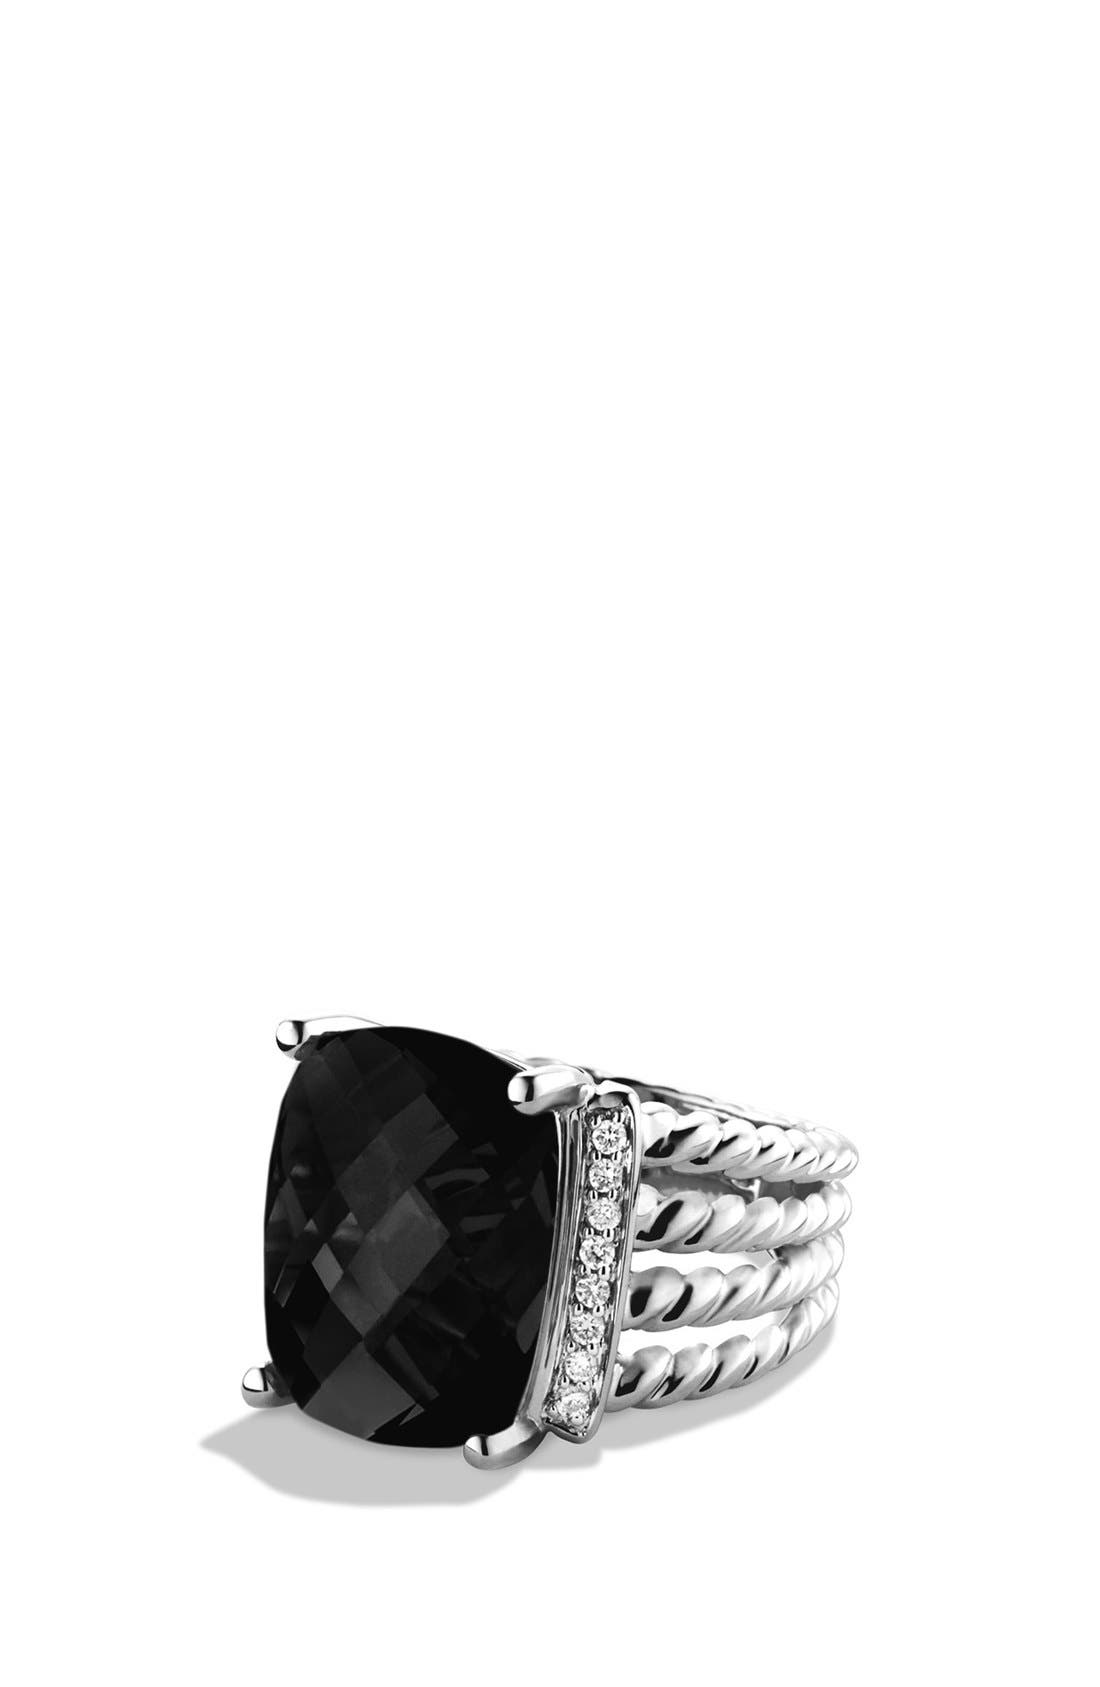 david yurman ring with stone u0026 diamonds black onyx prasiolite